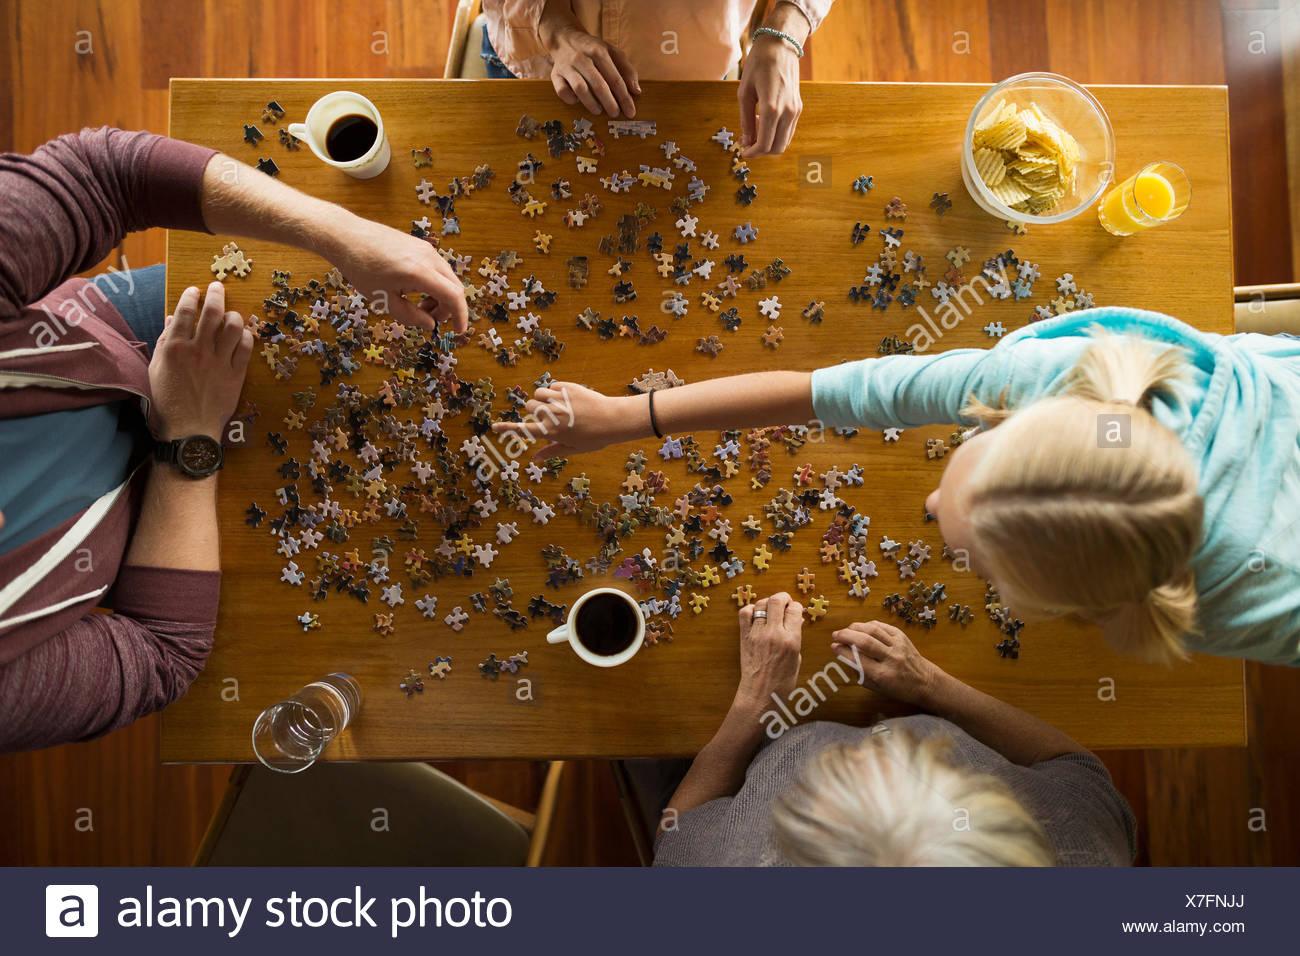 Vista aérea familia armar rompecabezas en la mesa Imagen De Stock